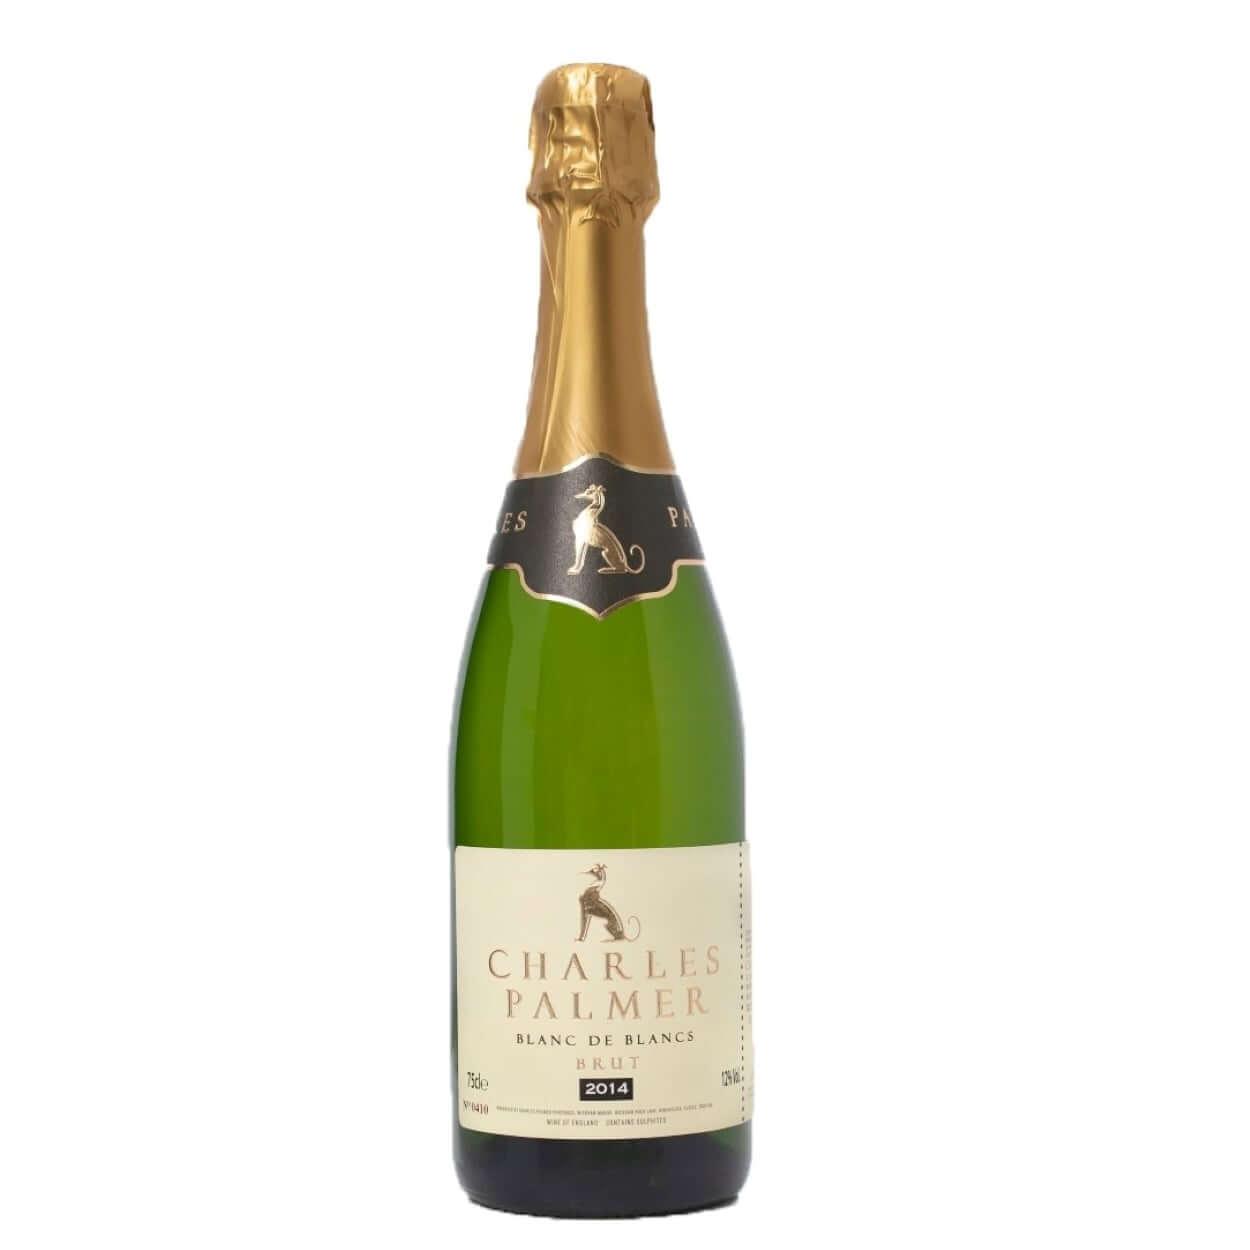 Charles Palmer Blanc de Blancs 2014 Sparkling English Wine